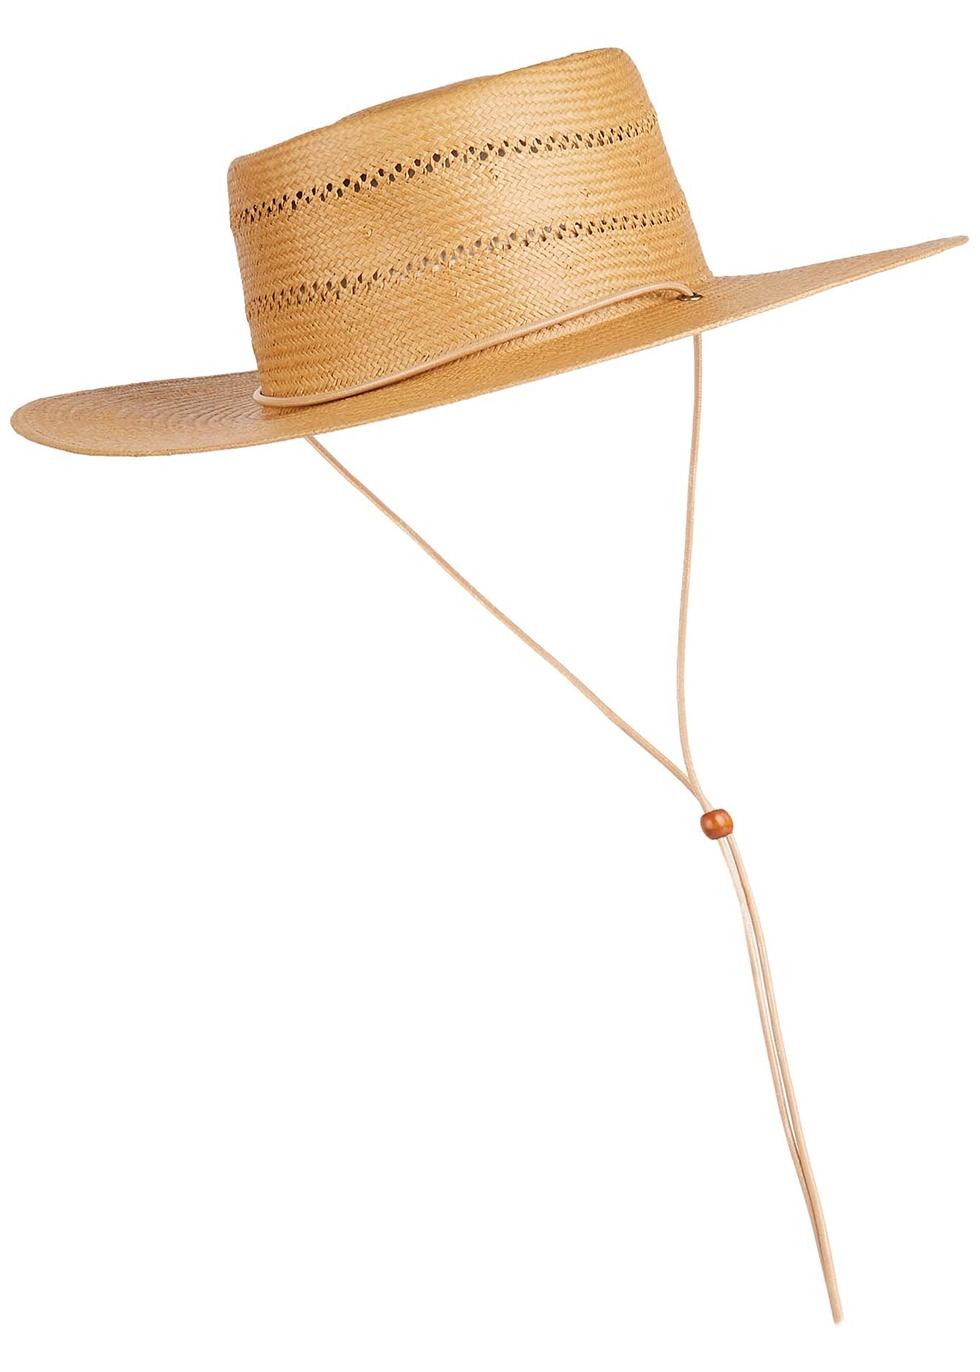 Jacinto camel straw sun hat